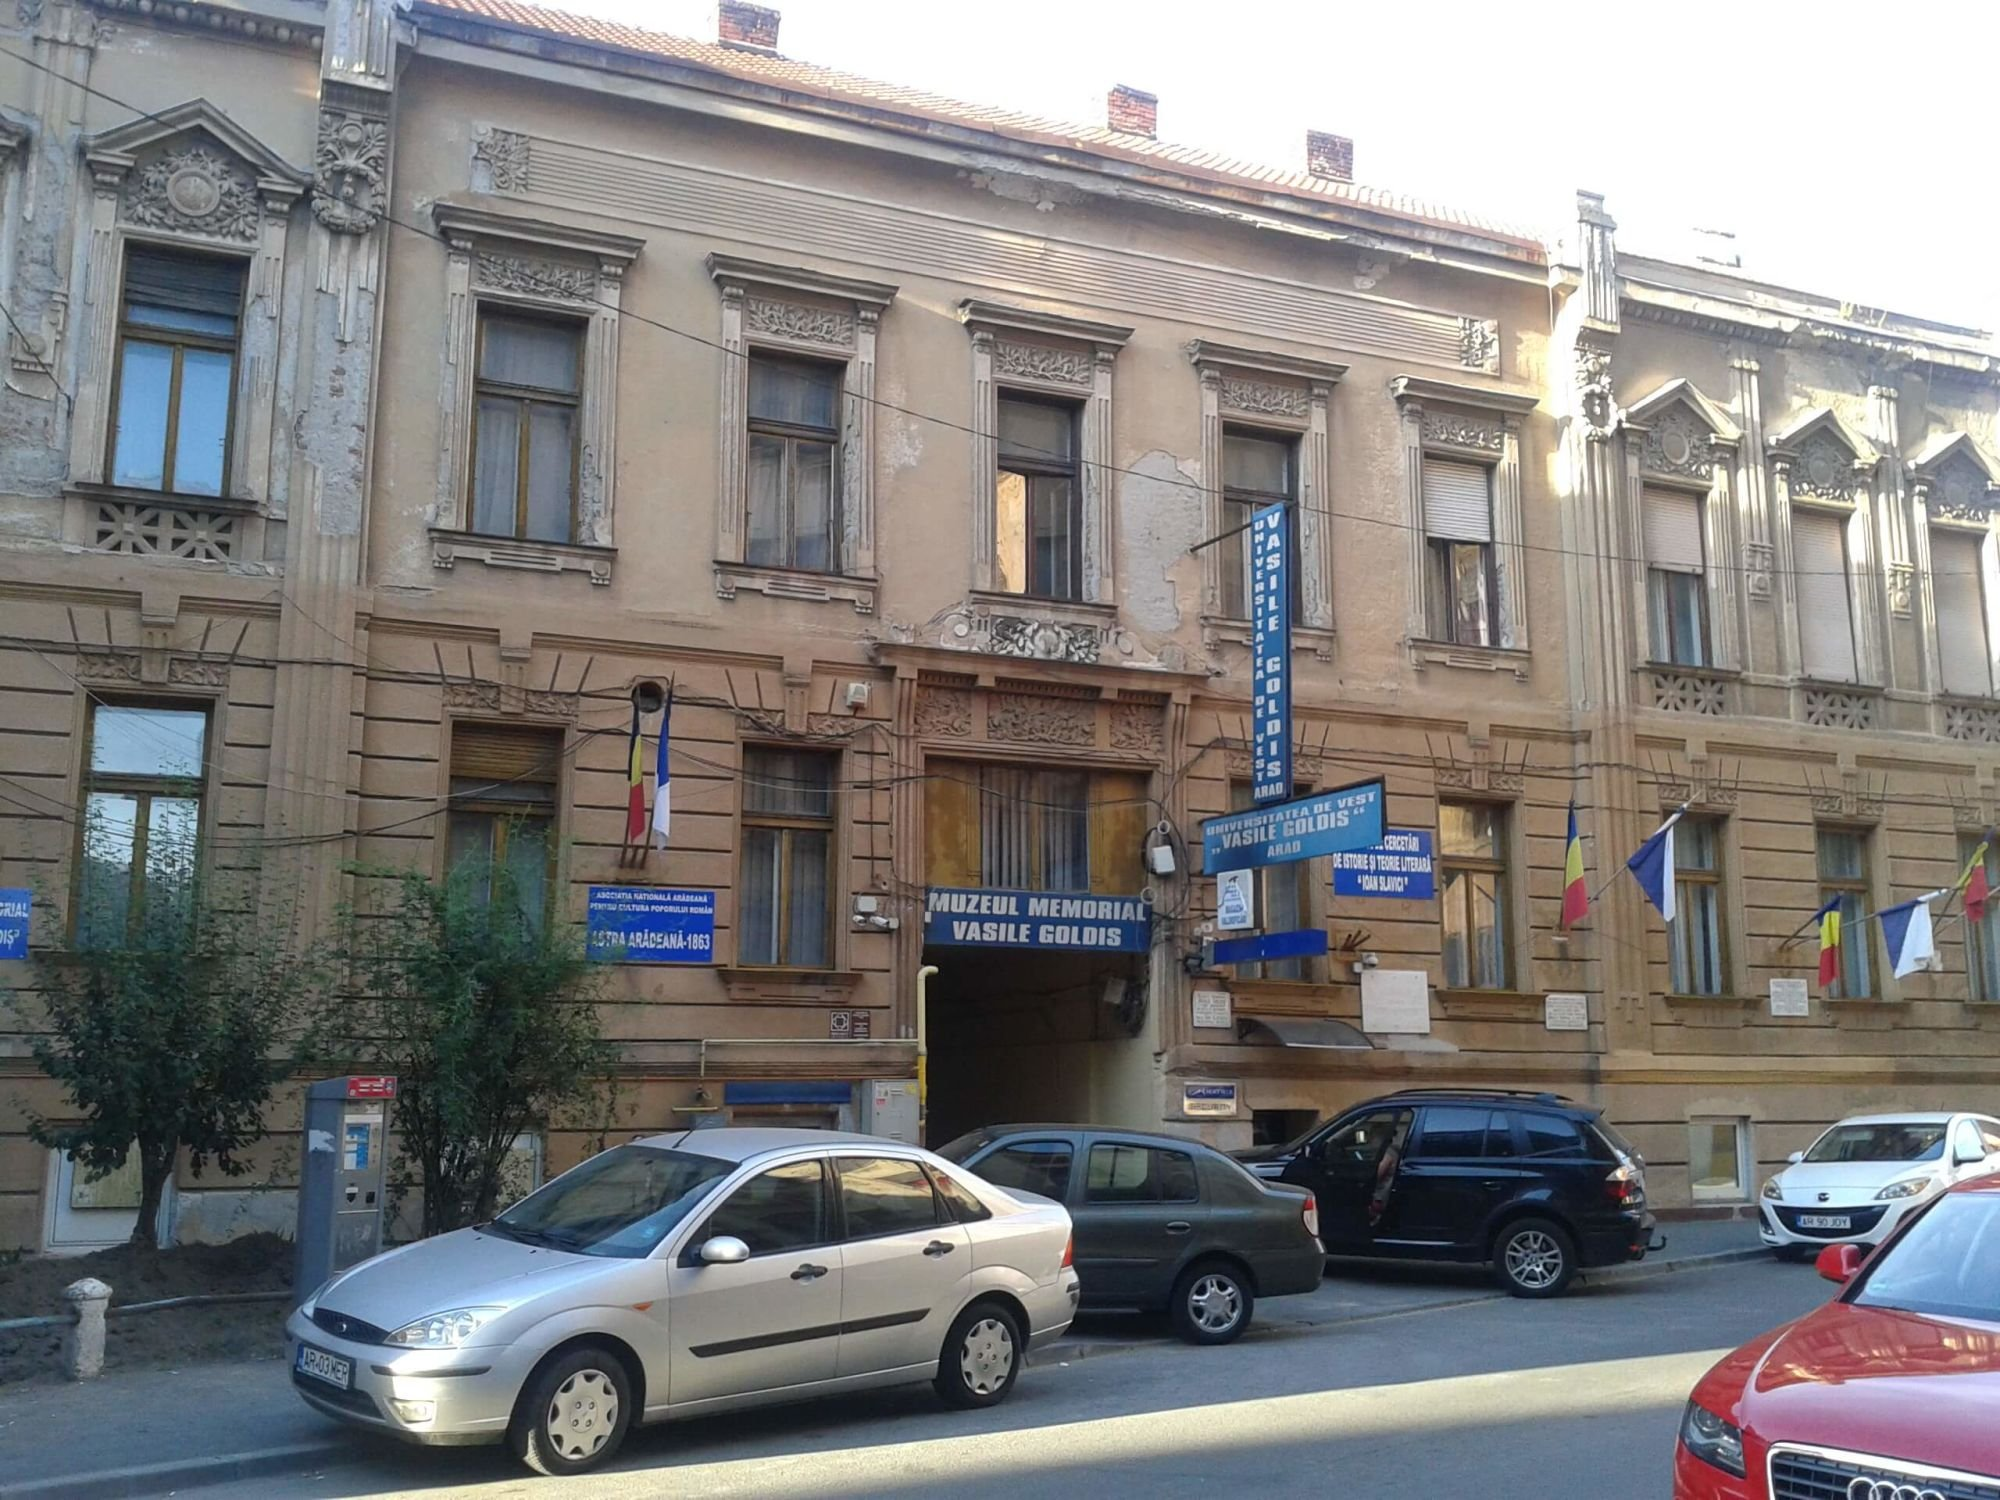 Casa Goldis din Arad